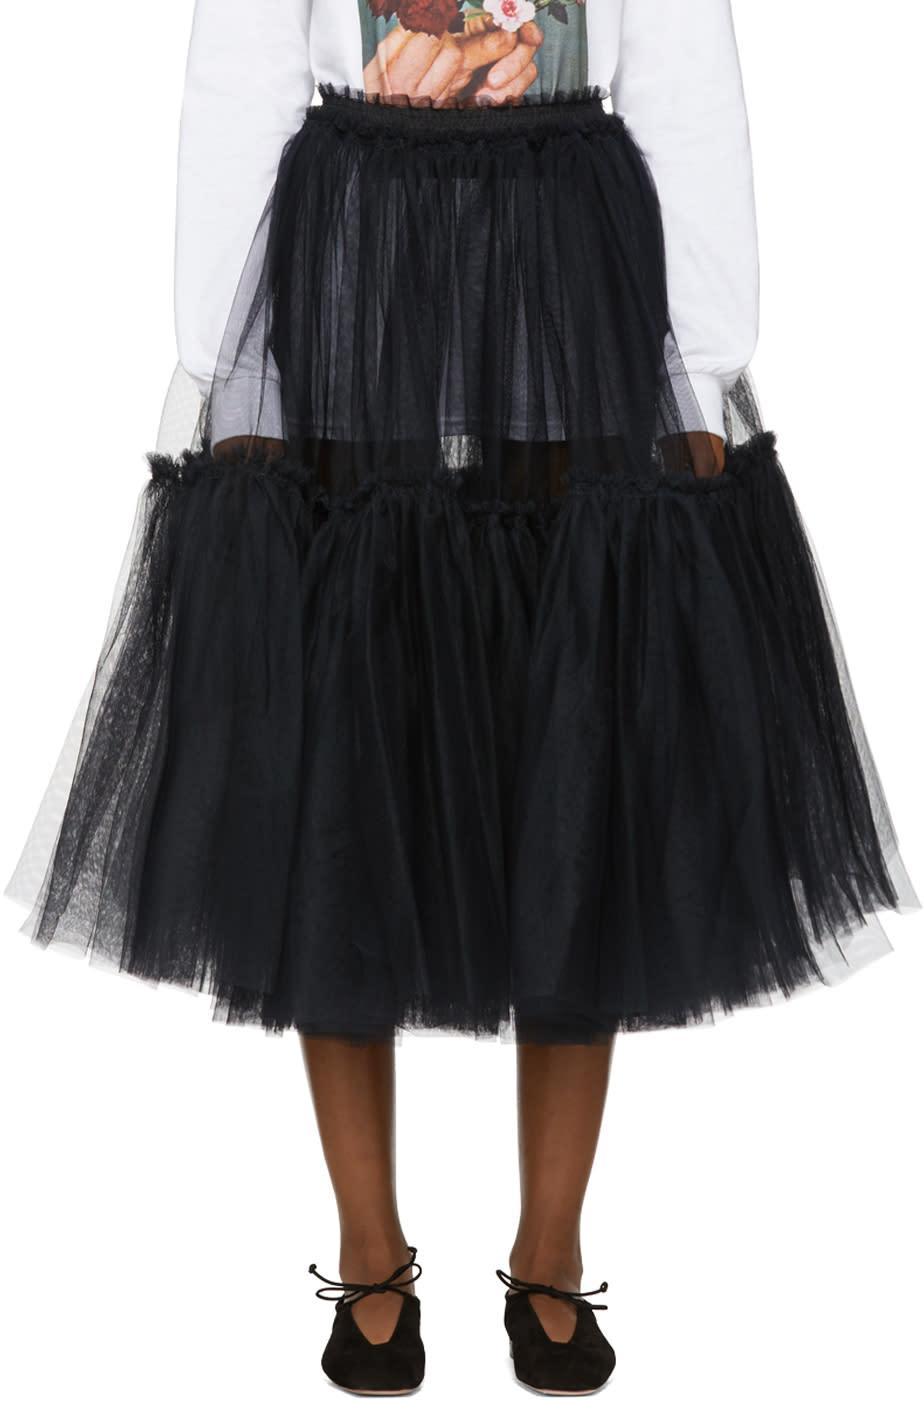 Image of Molly Goddard Black Gloria Skirt